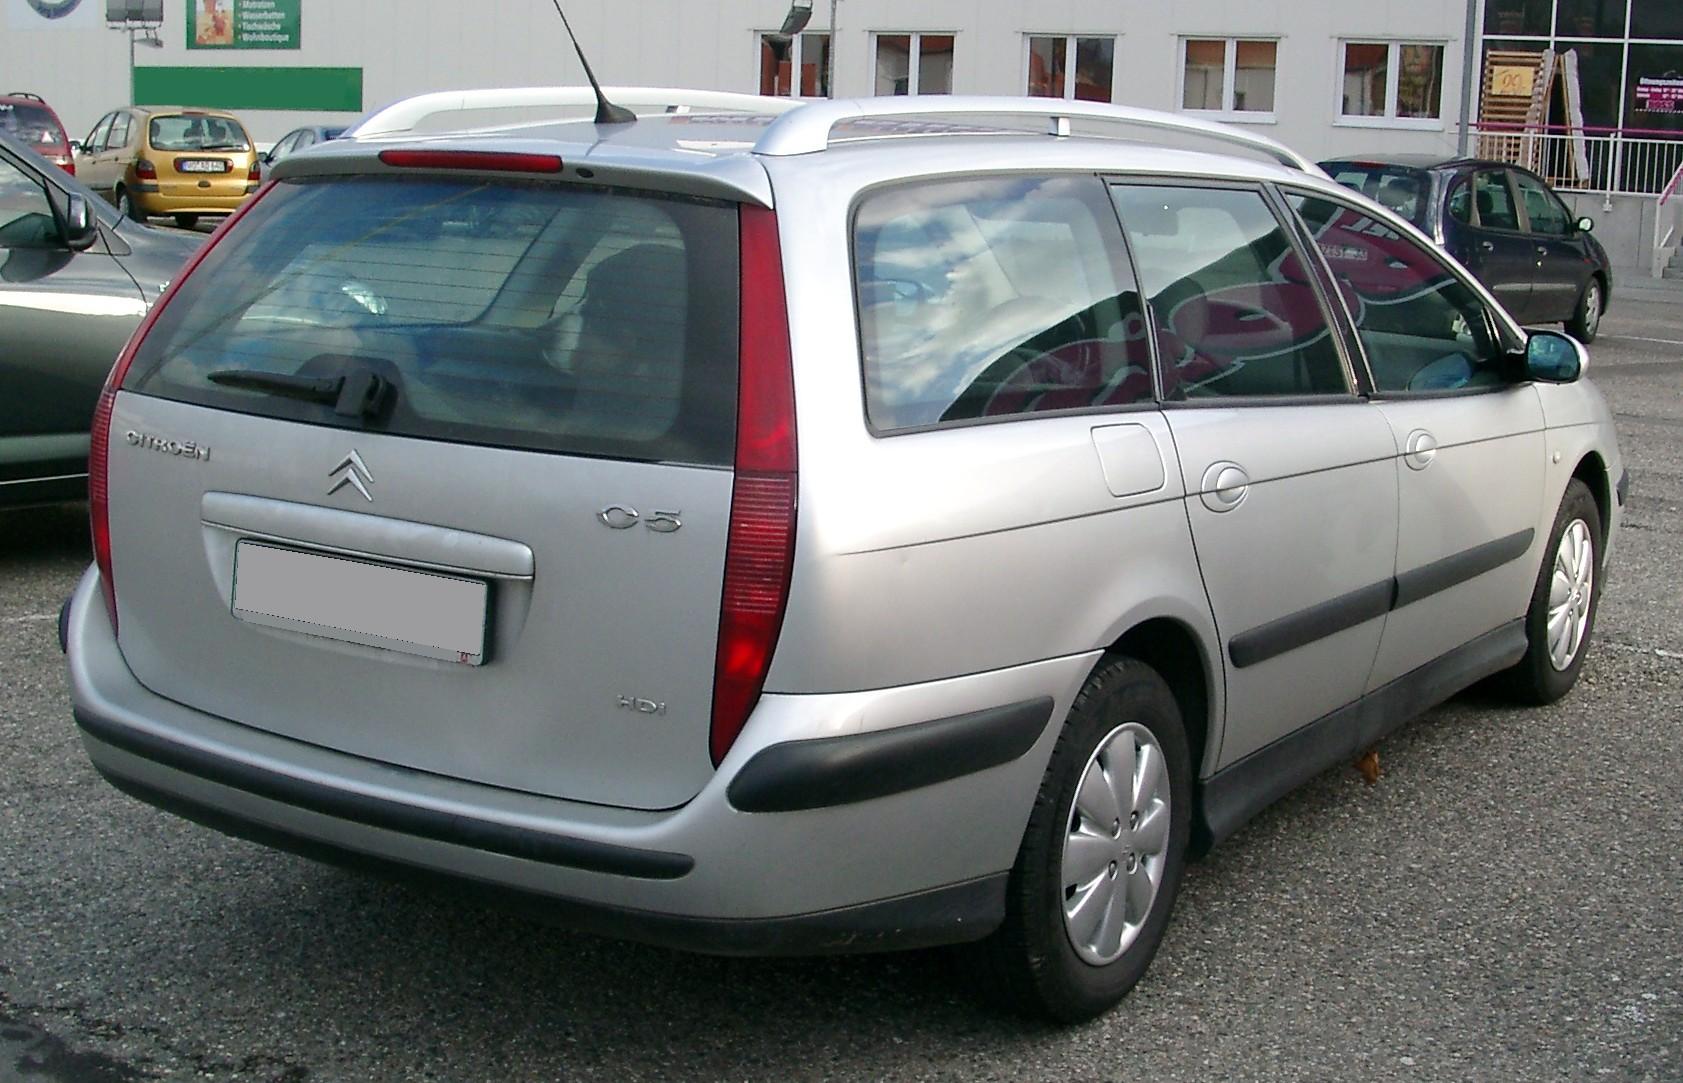 http://upload.wikimedia.org/wikipedia/commons/5/58/Citroen_C5_Kombi_rear_20071112.jpg